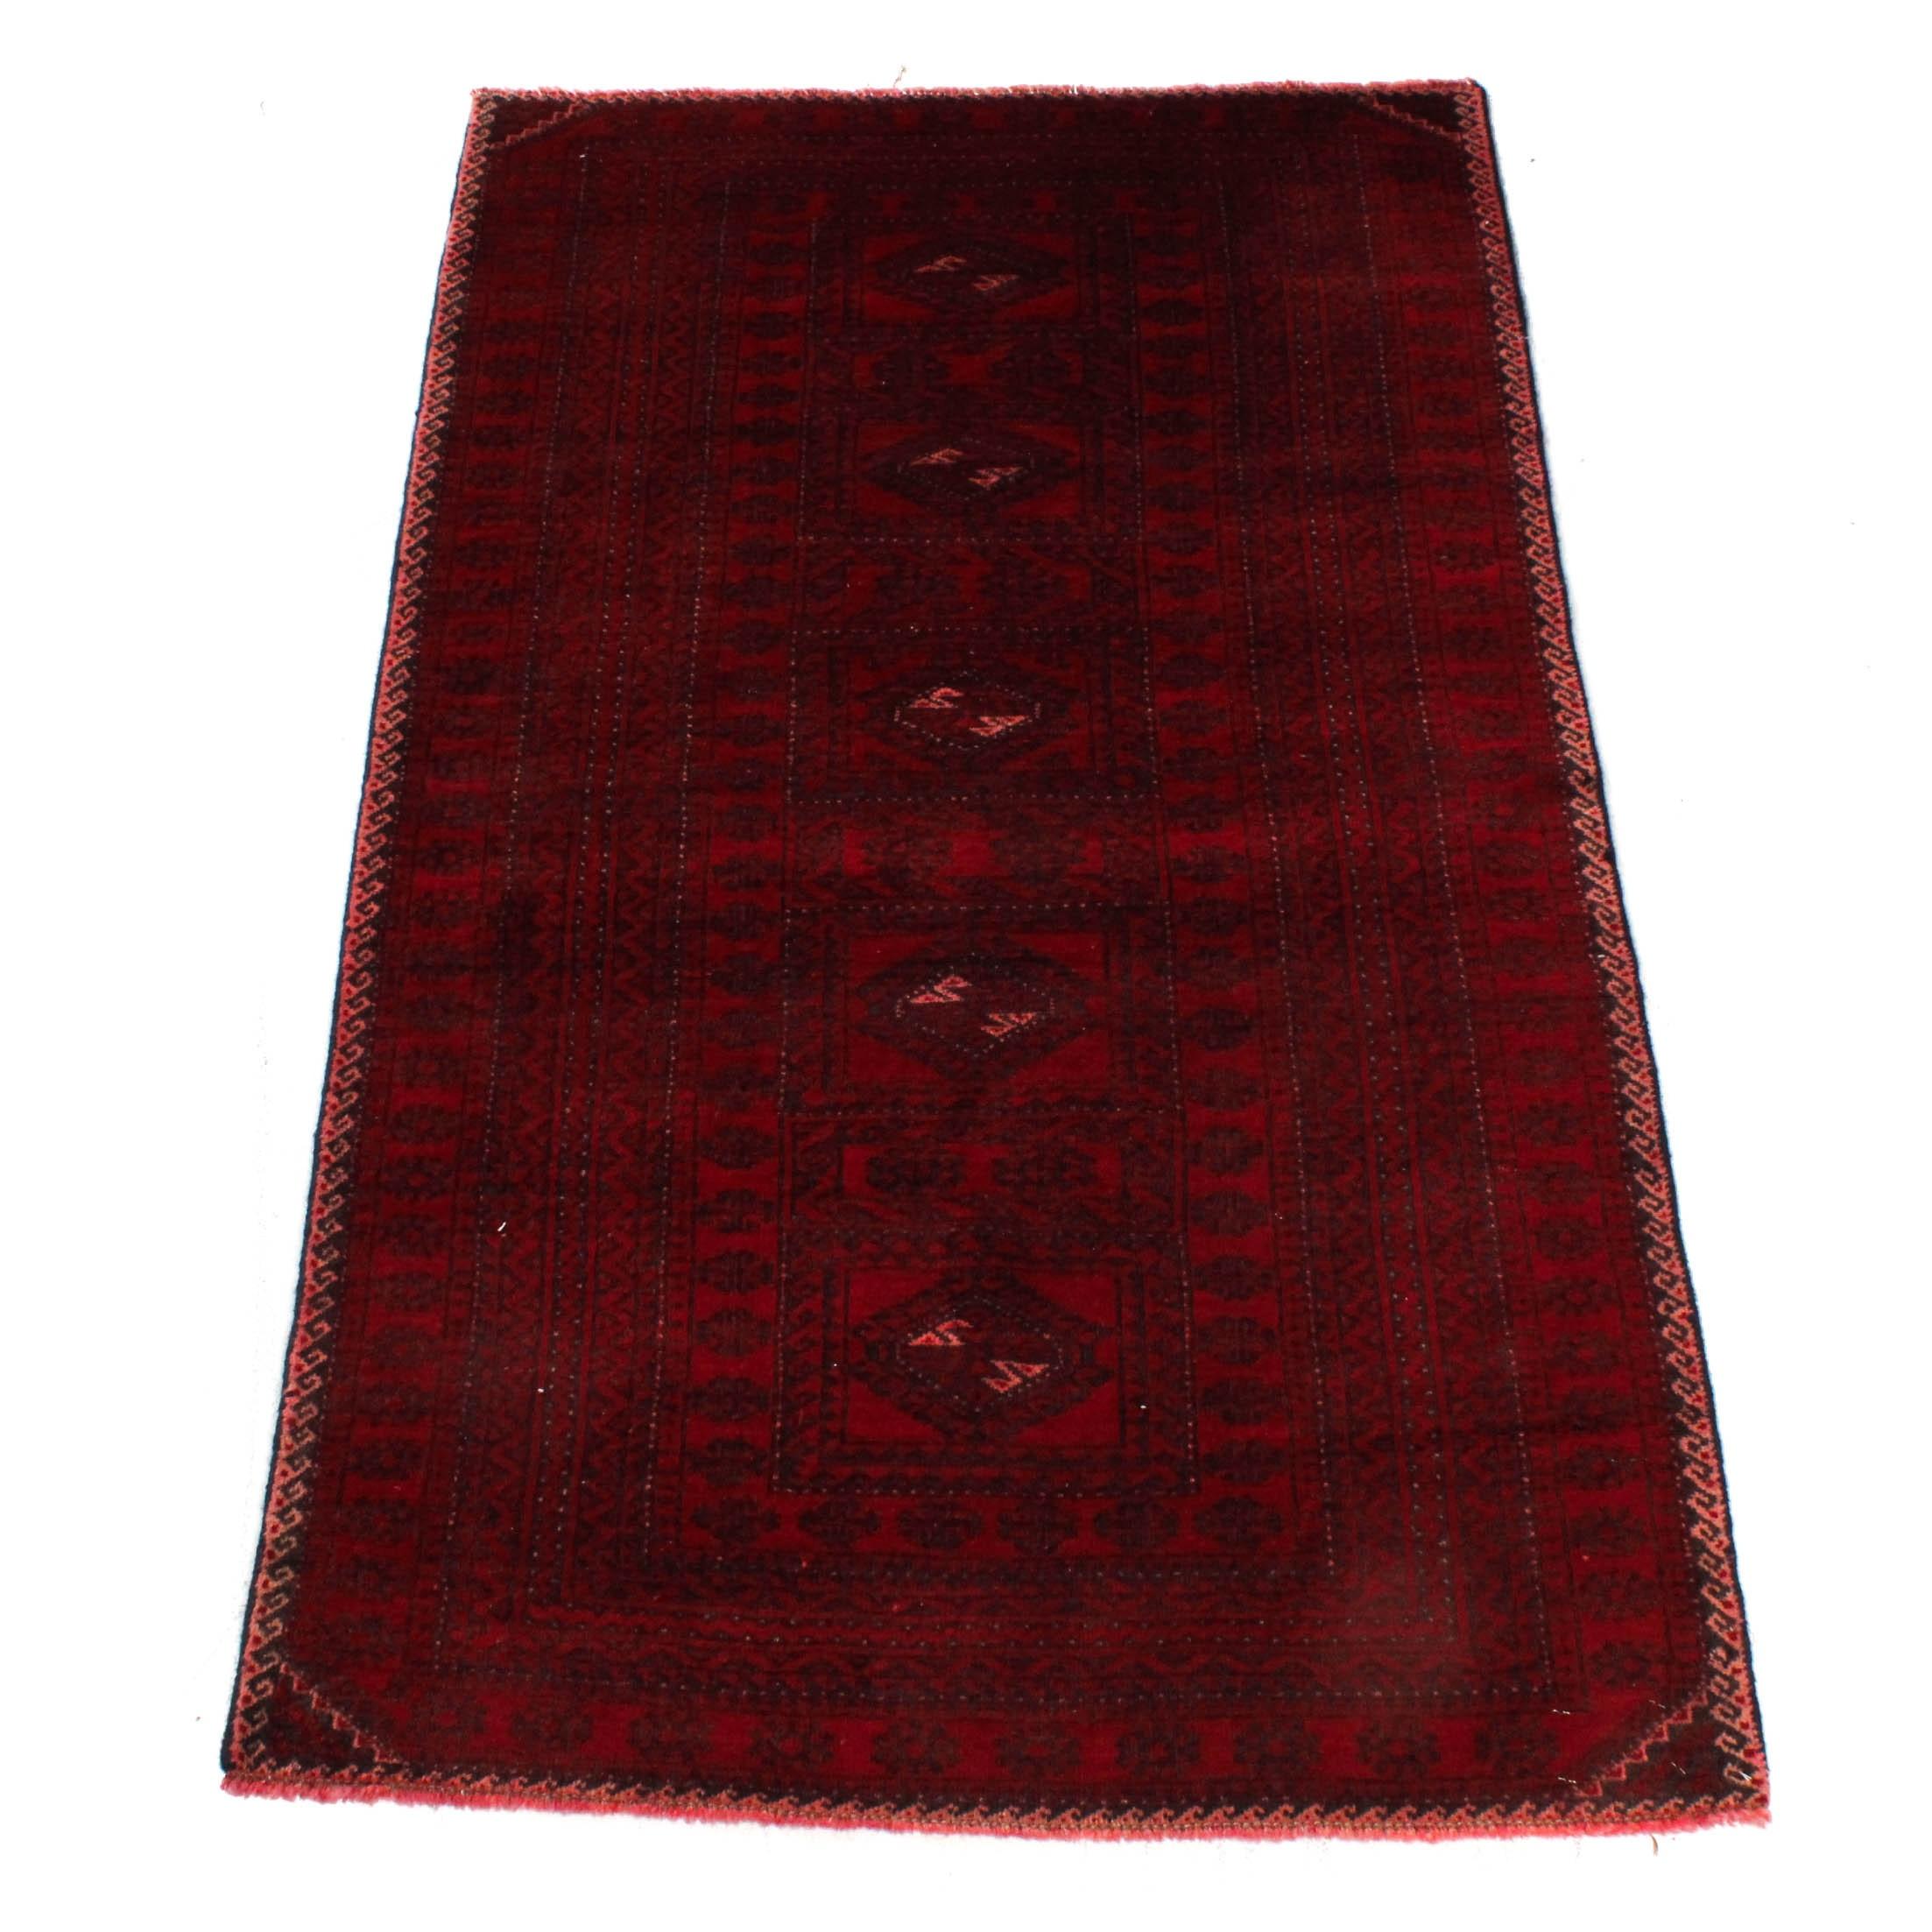 Vintage Hand-Knotted Persian Qashqai Turkmen Rug